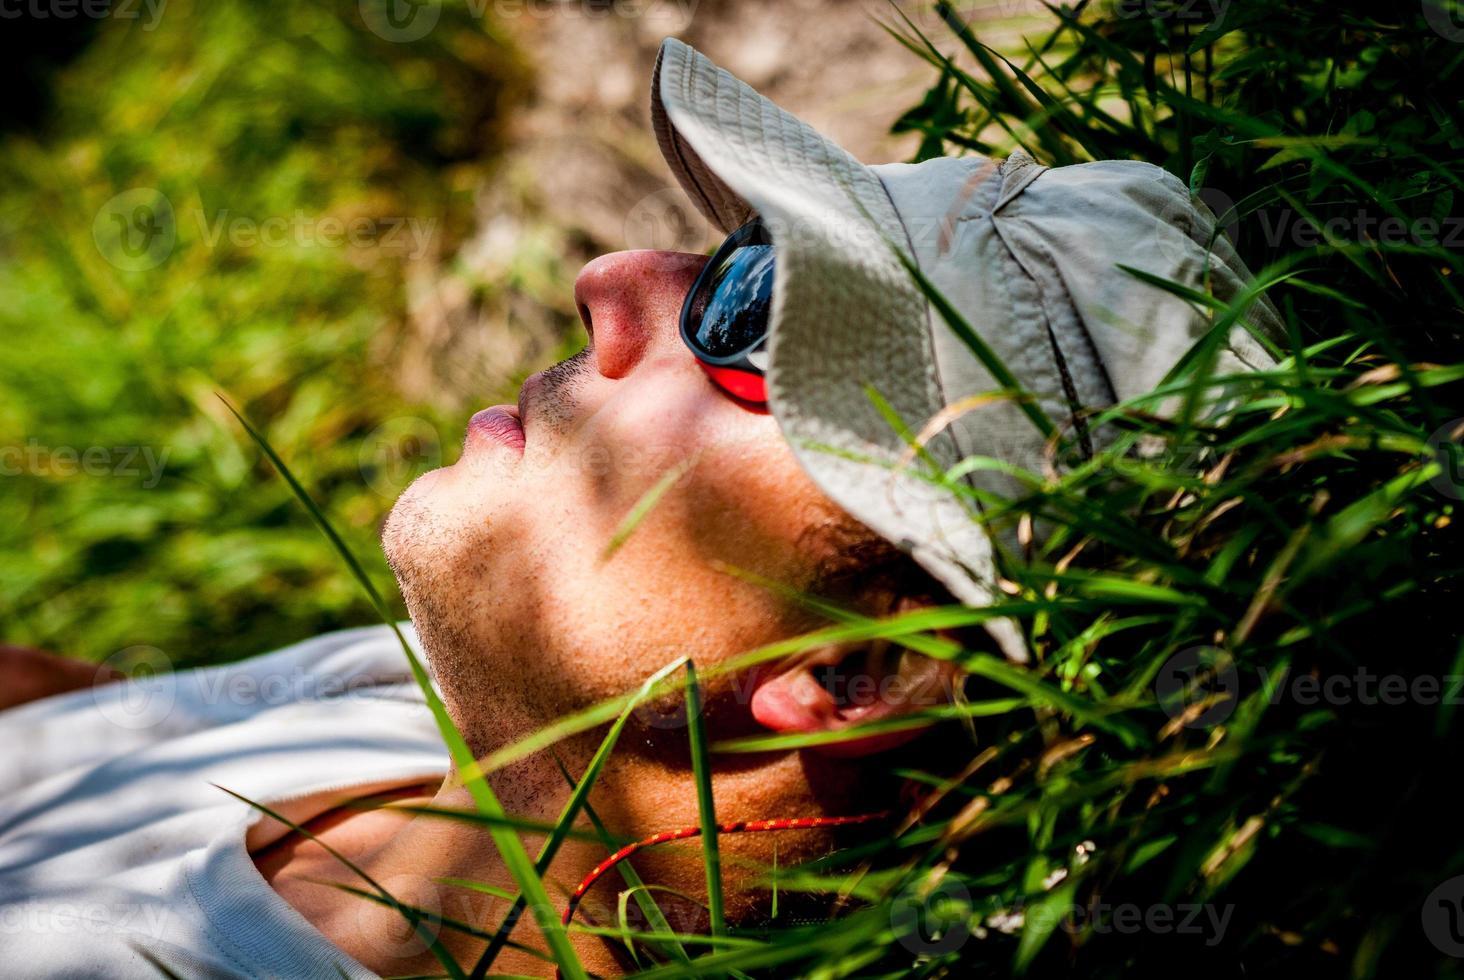 Man sleeping on the grass, Hiking photo